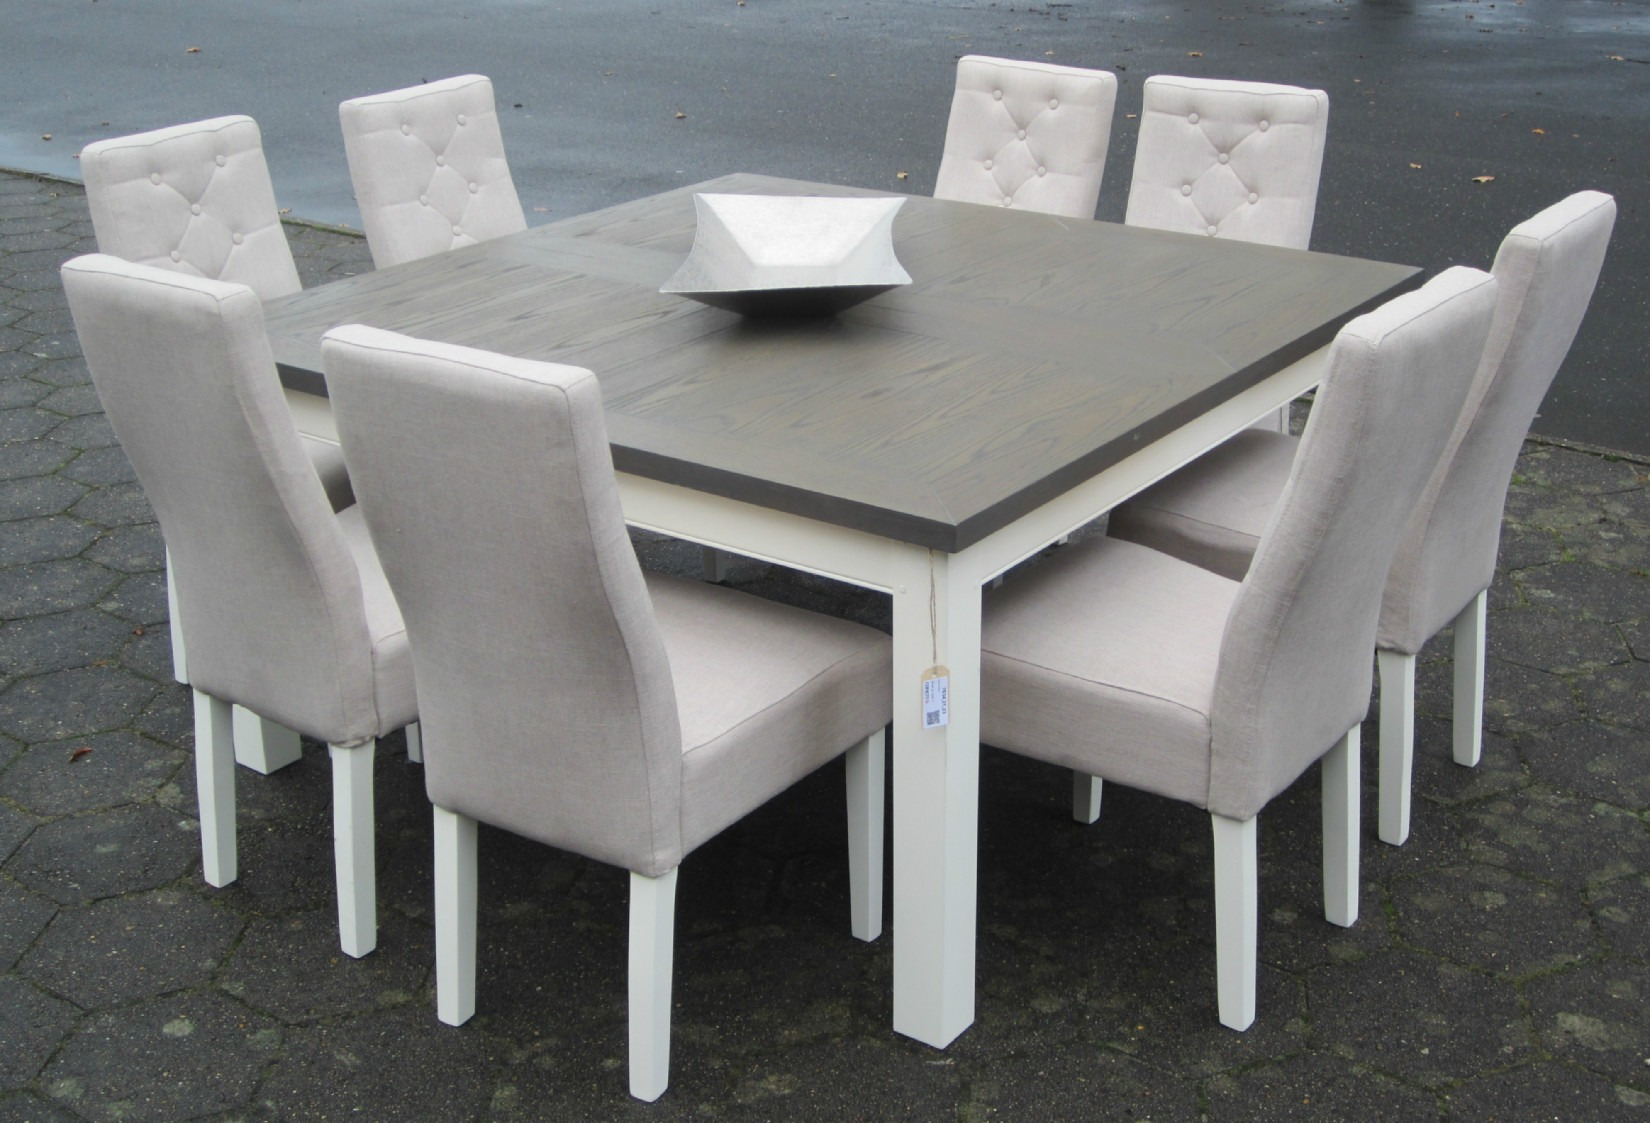 Skagen, samtalebord,spisebord